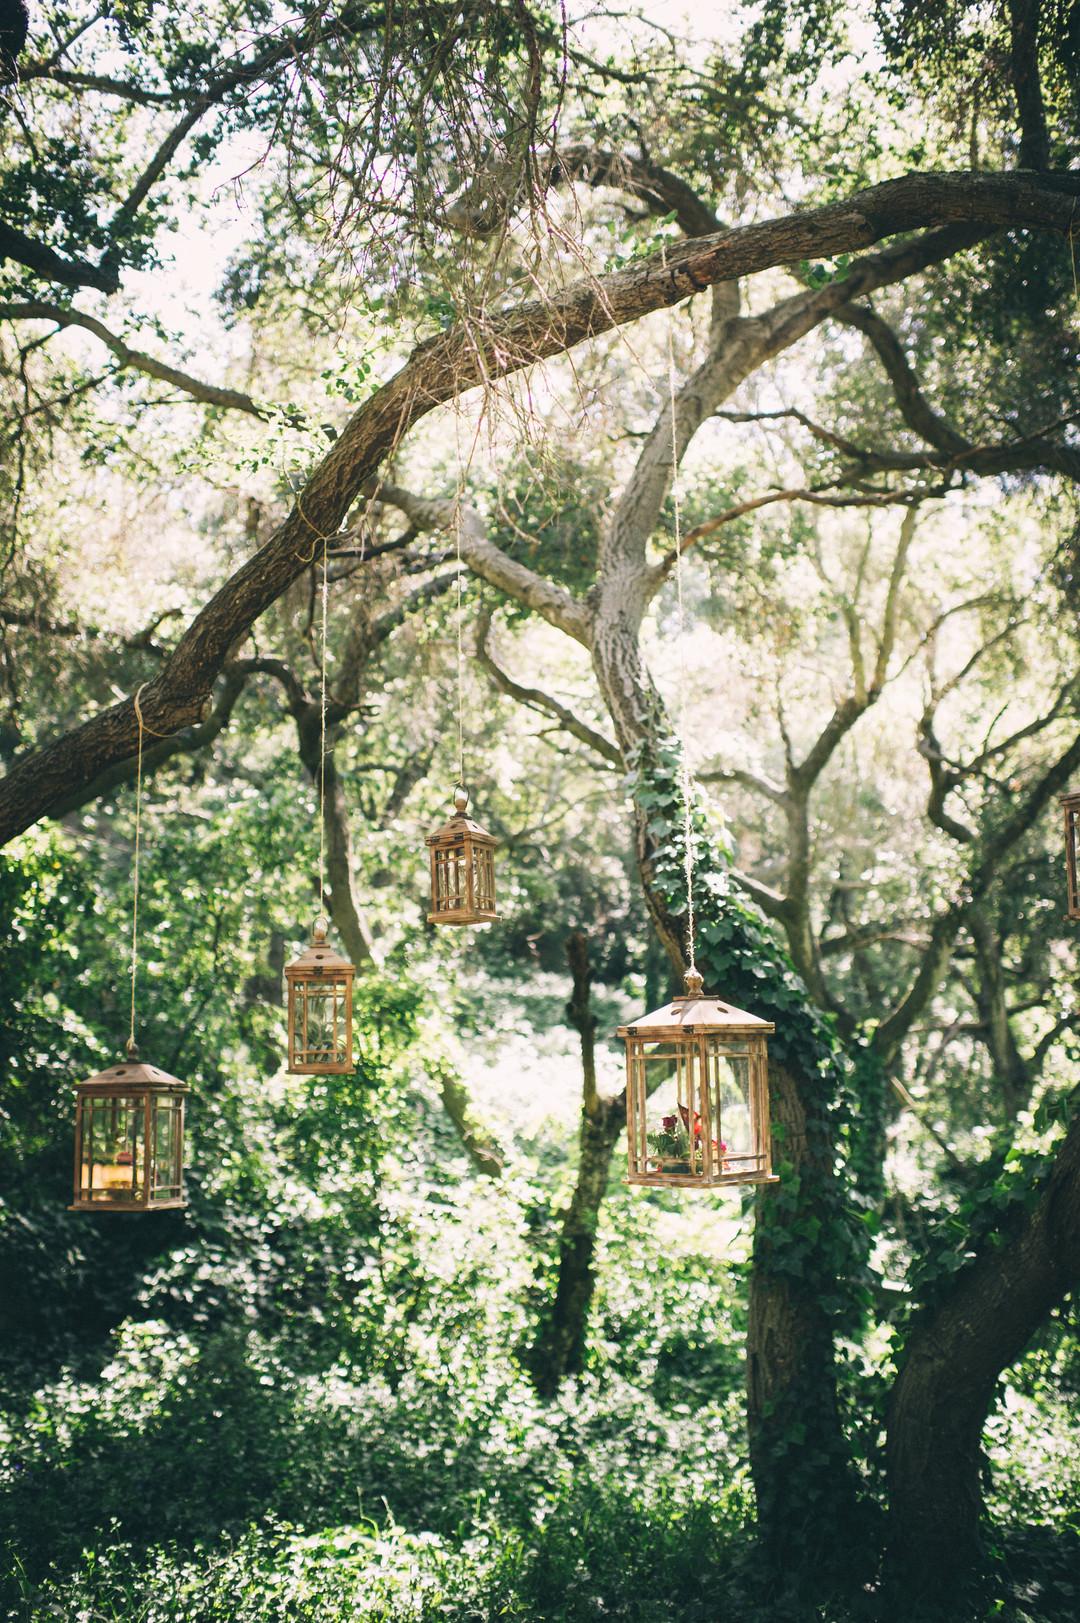 www.santabarbarawedding.com | Sarah Katherine Davis Photography | Santa Barbara Museum of Natural History | Wild Heart Events | Party Pleasers | Lanterns Hanging from Trees